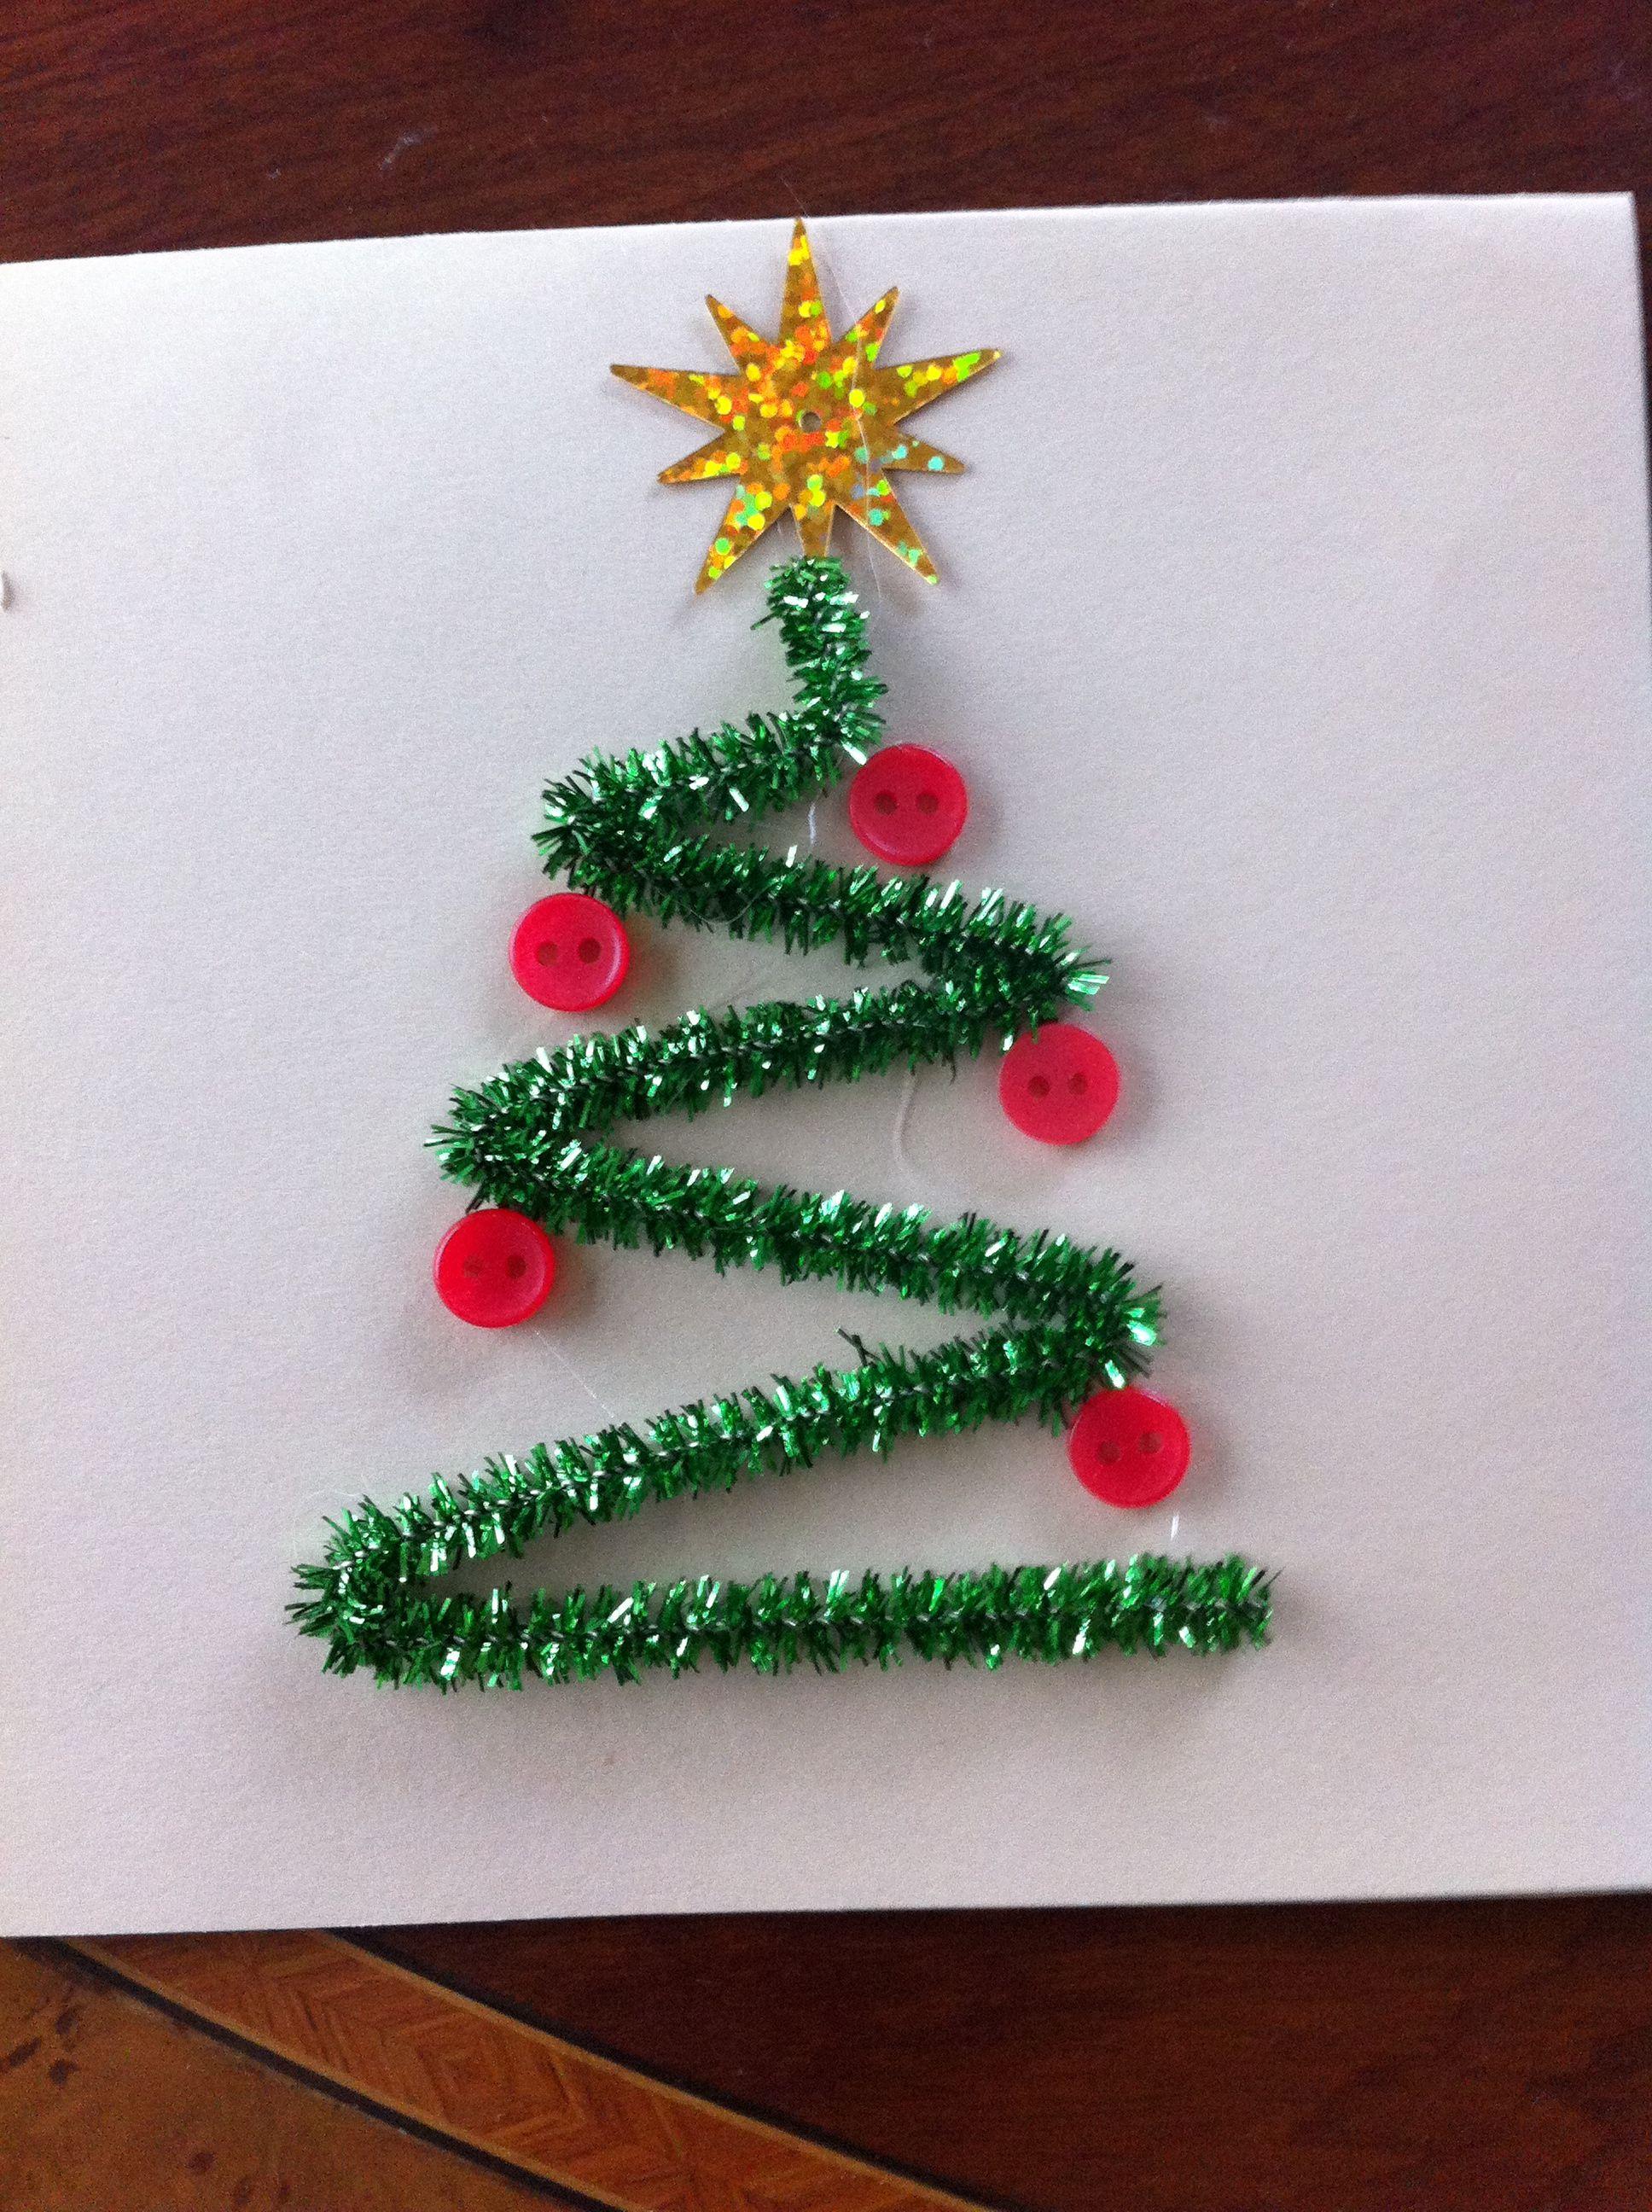 Tarjeta navide a navidad actividades navide as for Arbol de navidad manualidades para ninos